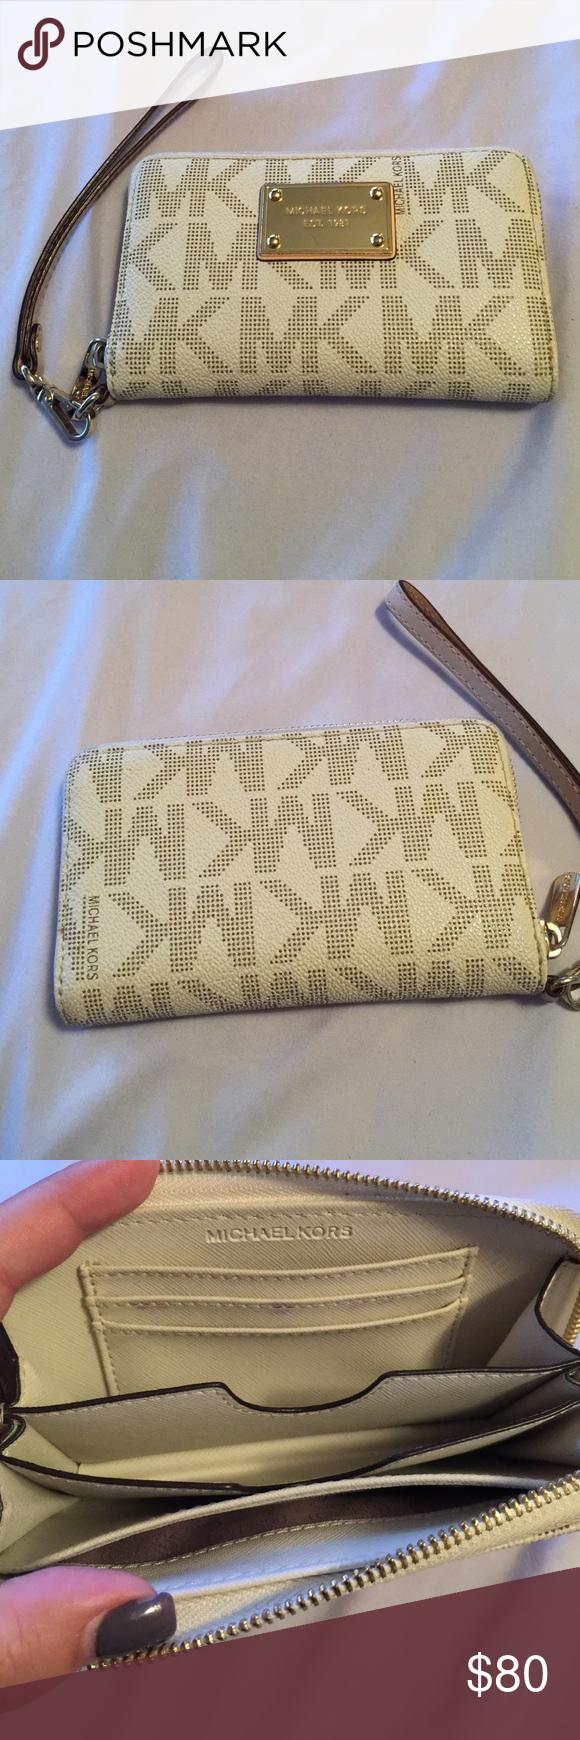 Michael Kors Wristlet Wallet Good condition! normal wear! Michael Kors Bags Wallets